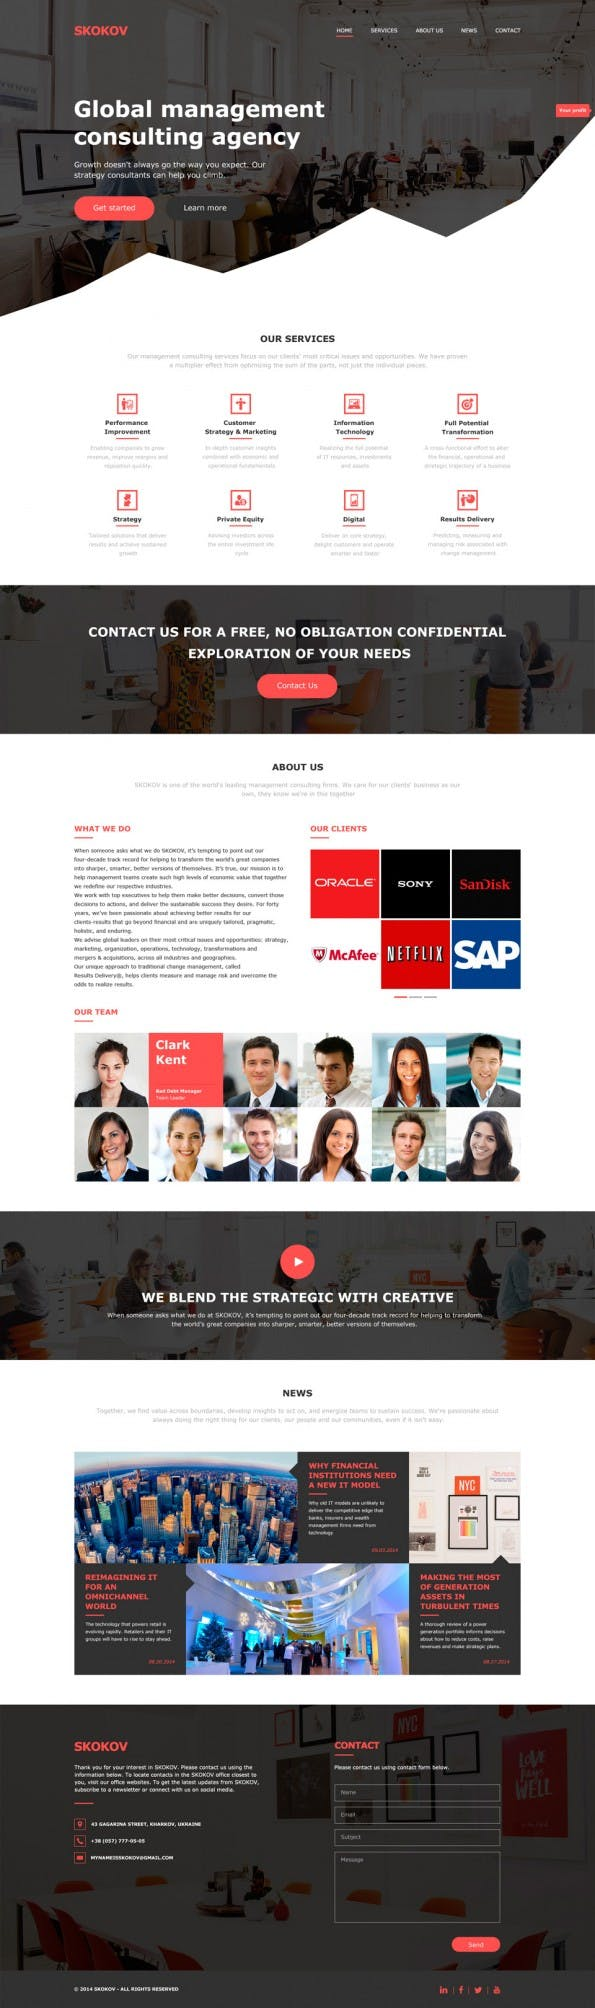 SKOKOV Profit — Free Business PSD Template - Web-Templates